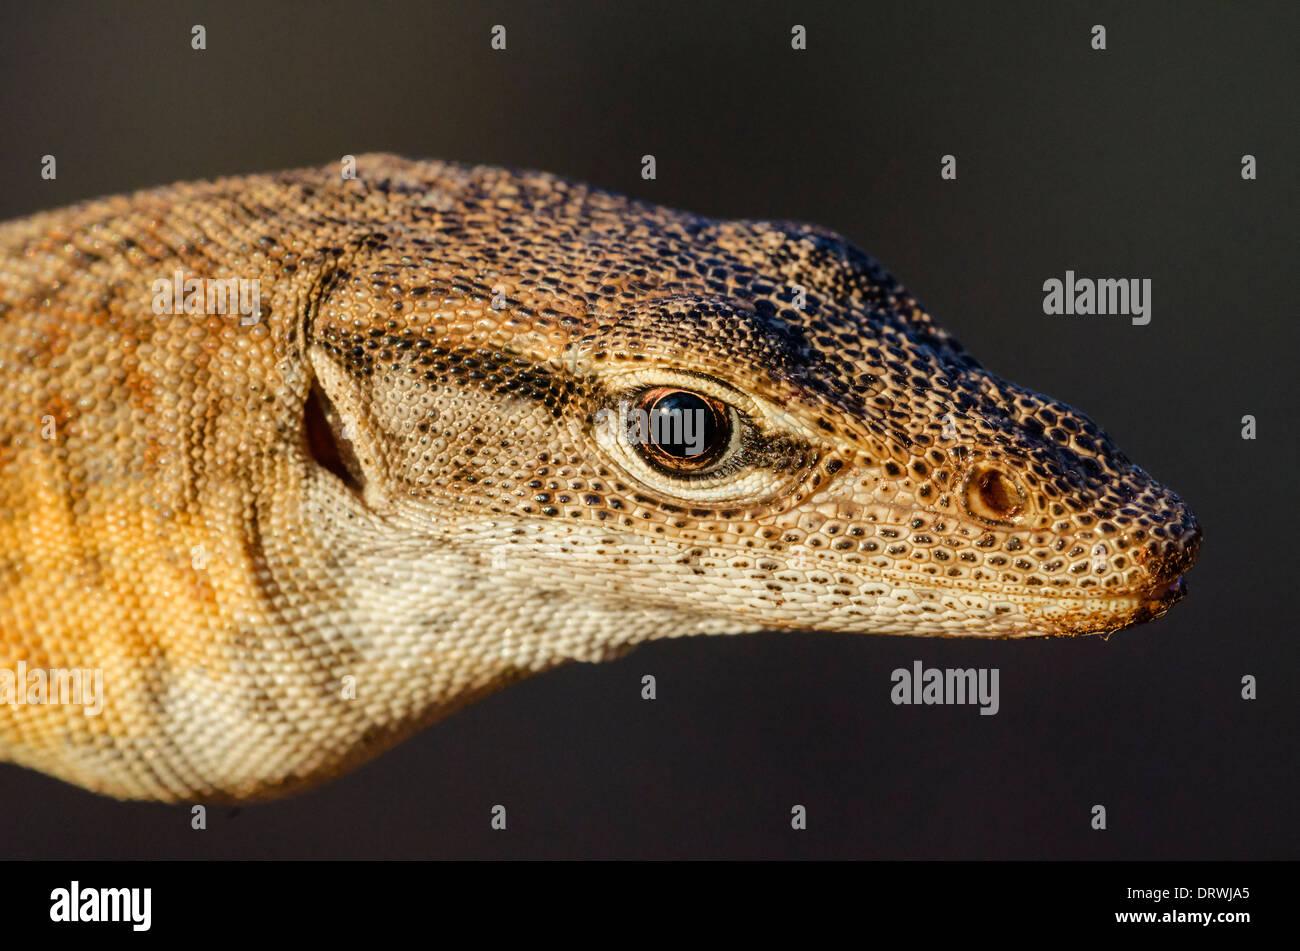 Freckled monitor Varanus tristis - Stock Image